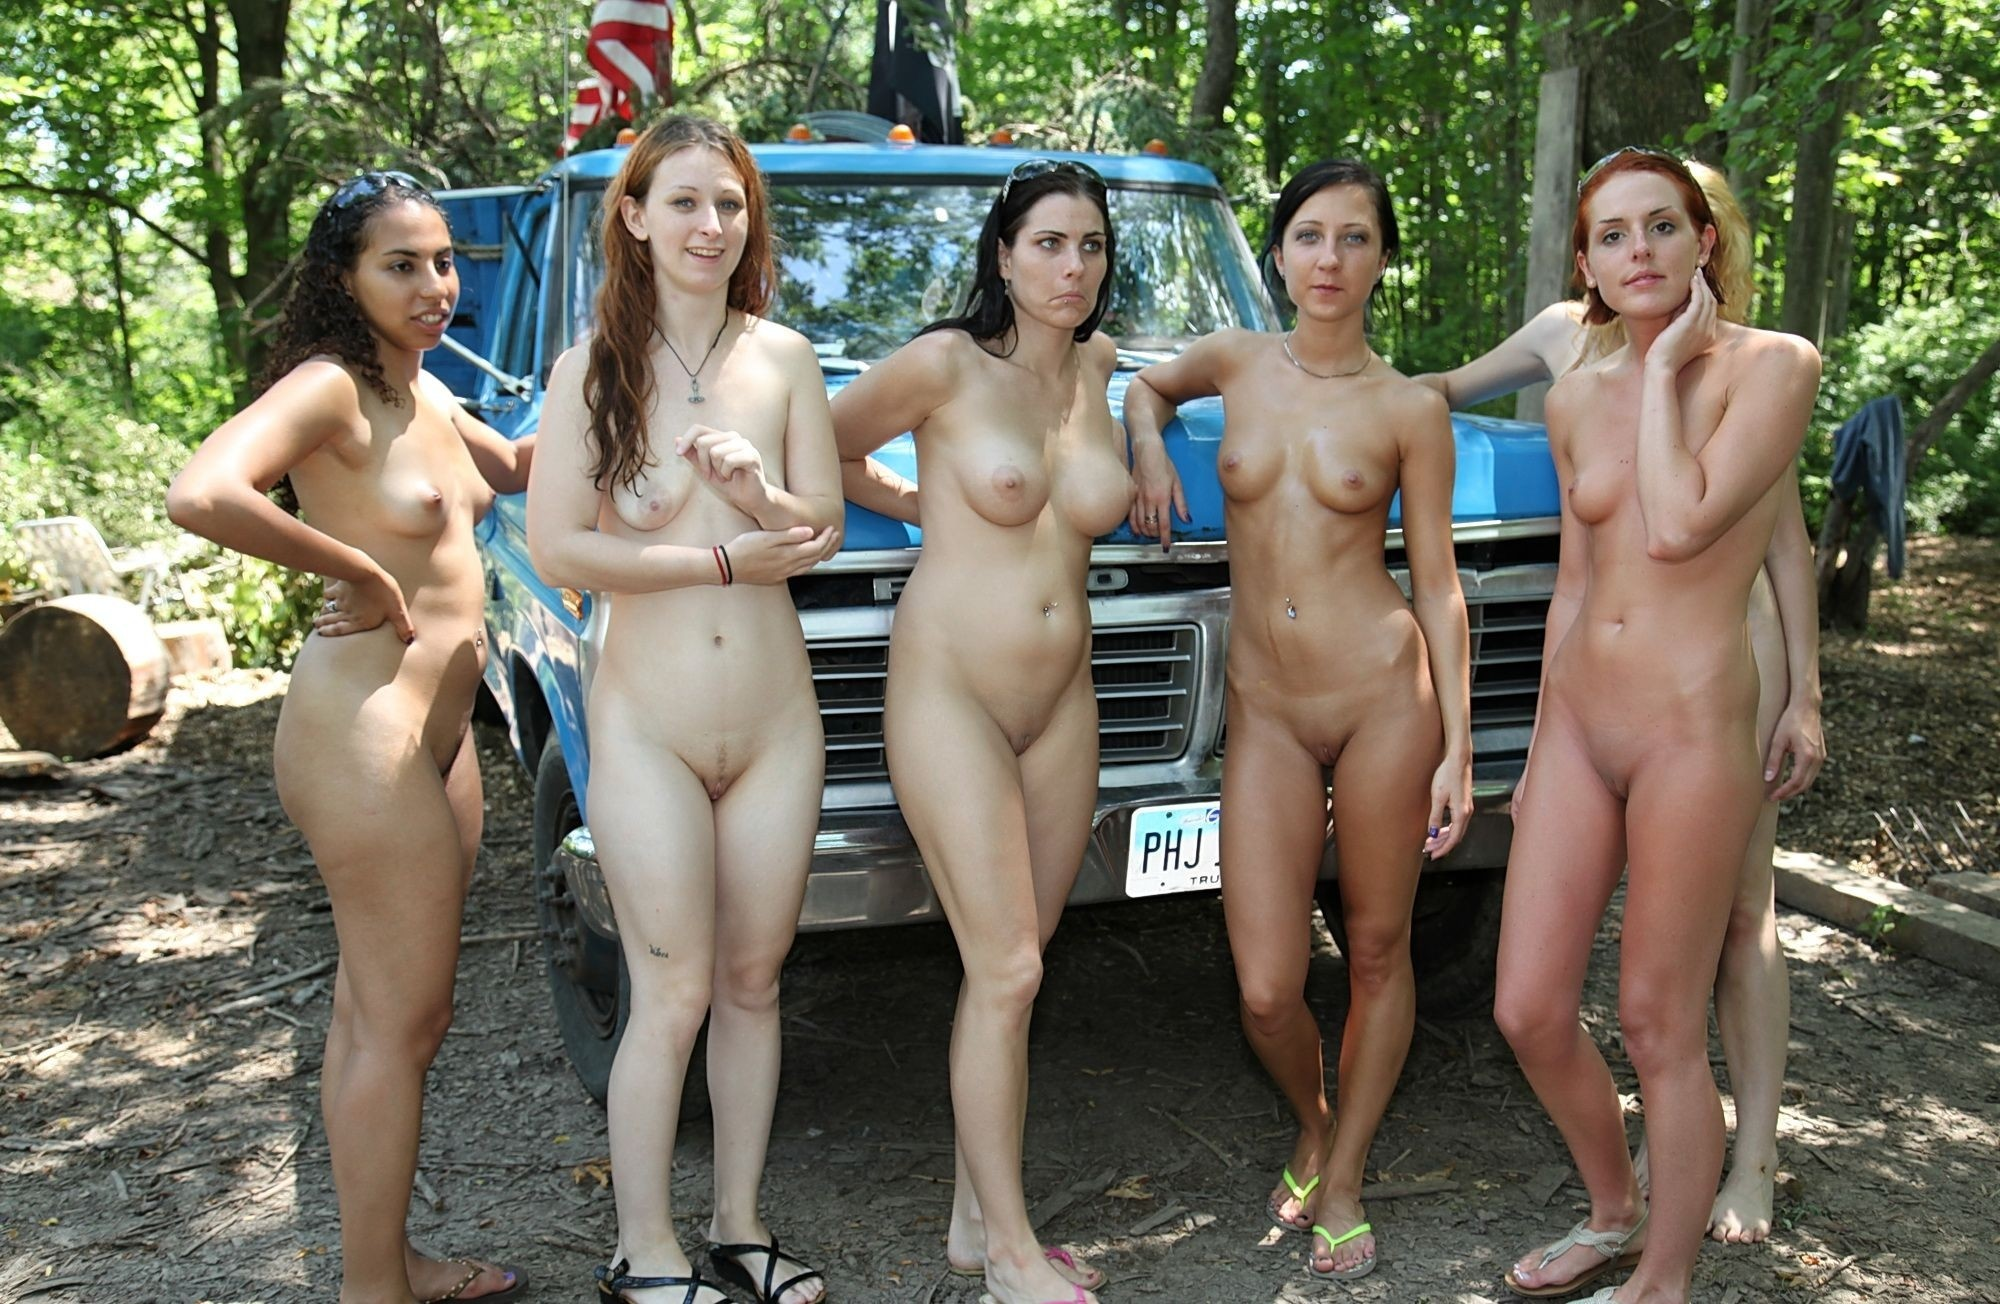 yonge-nacked-girls